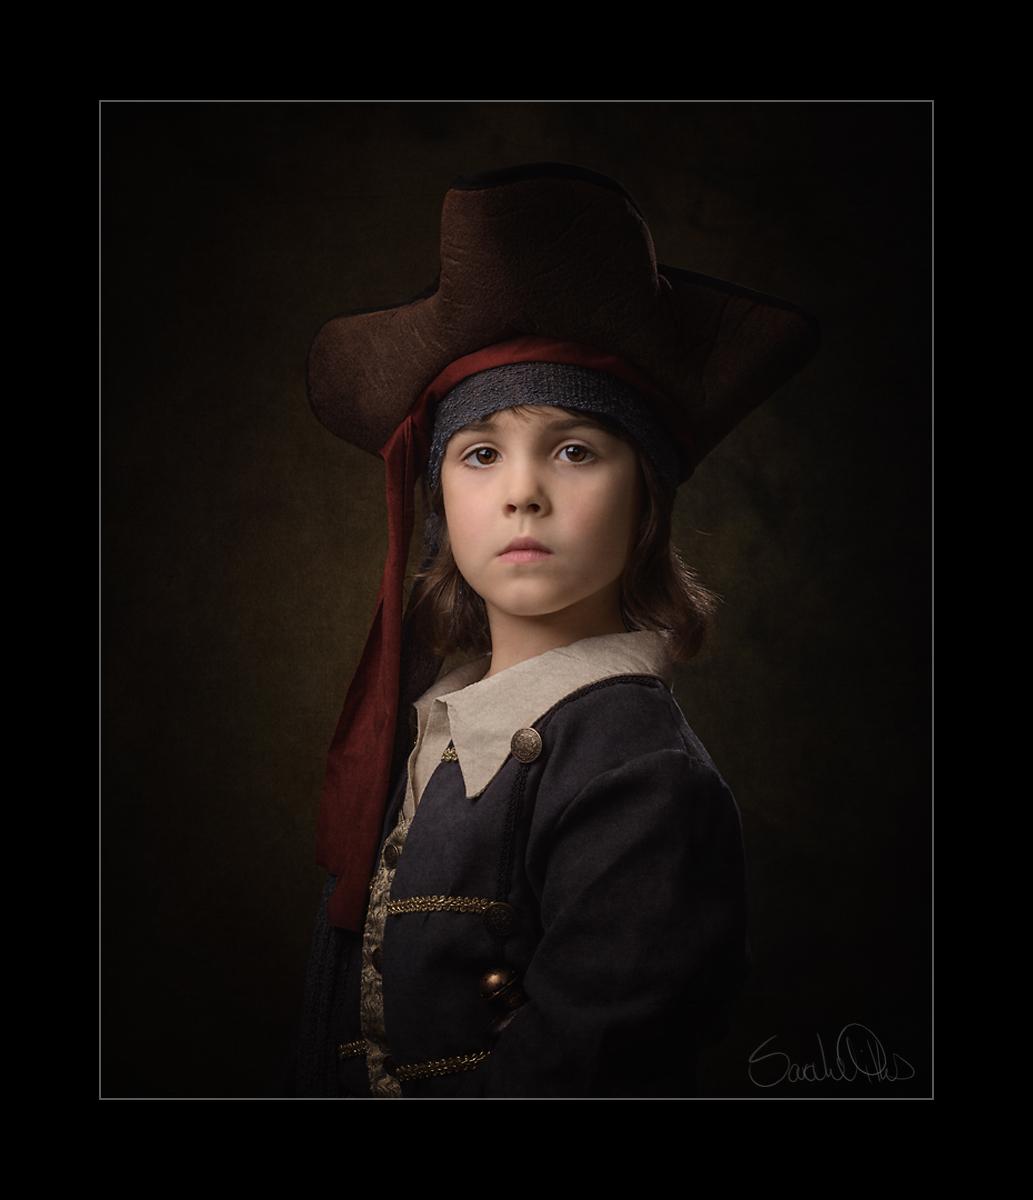 Pirate 002.jpg